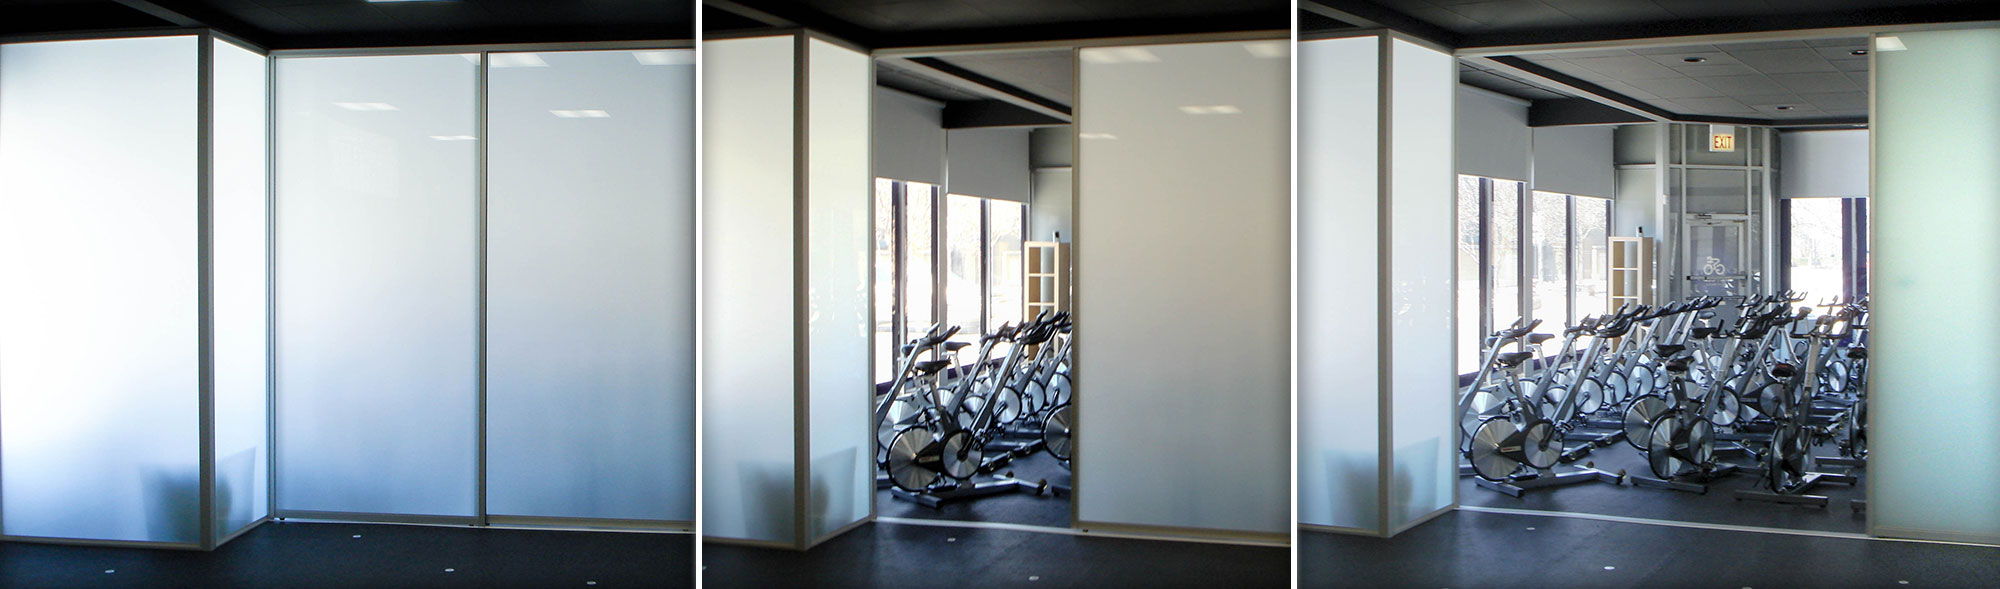 Fitness Centers & Creative Mirror u0026 Shower of Chicago   Mirrors Shower Doors u0026 Glass